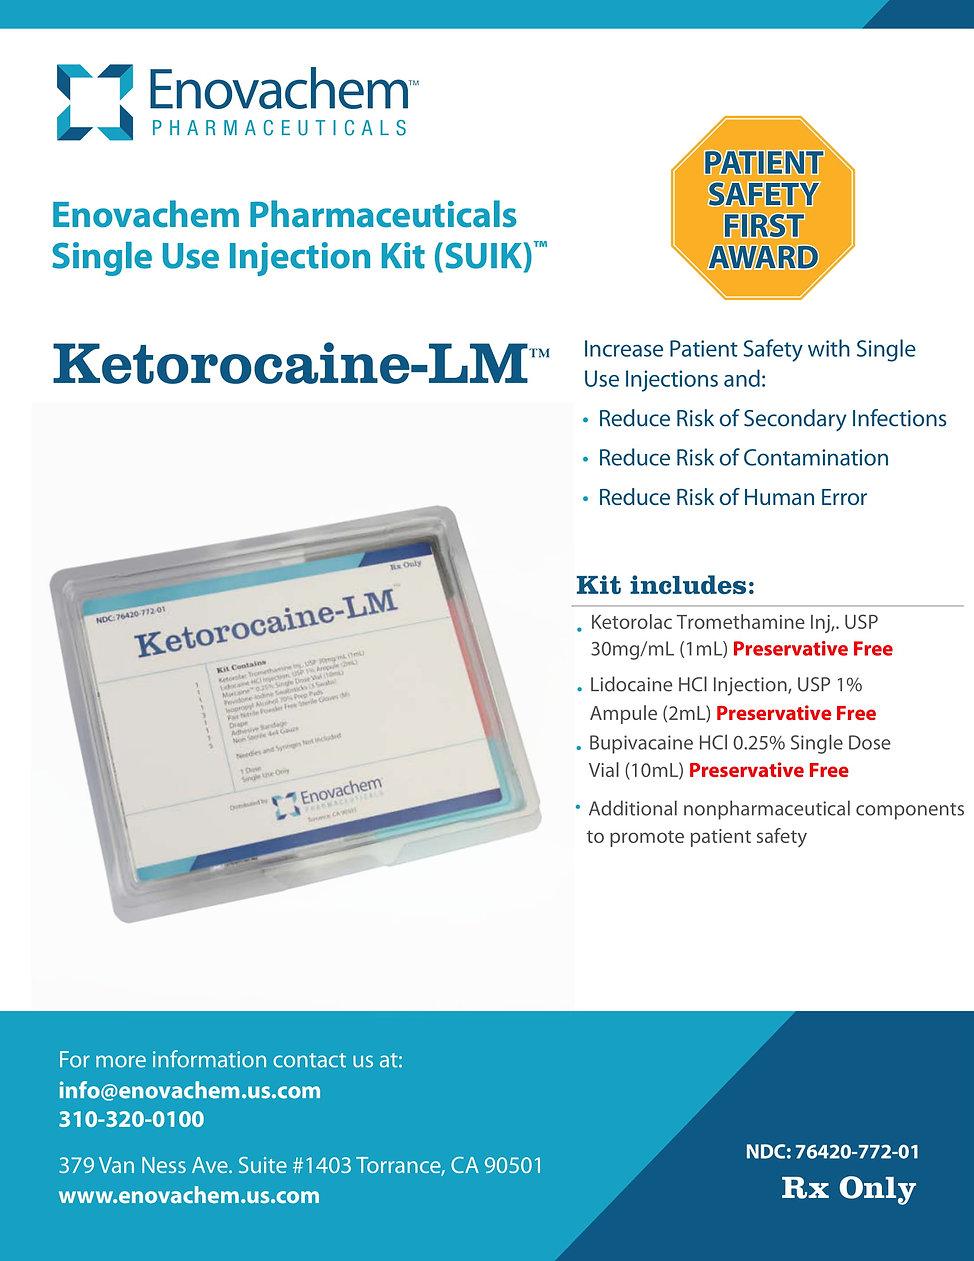 Ketorocaine-LM